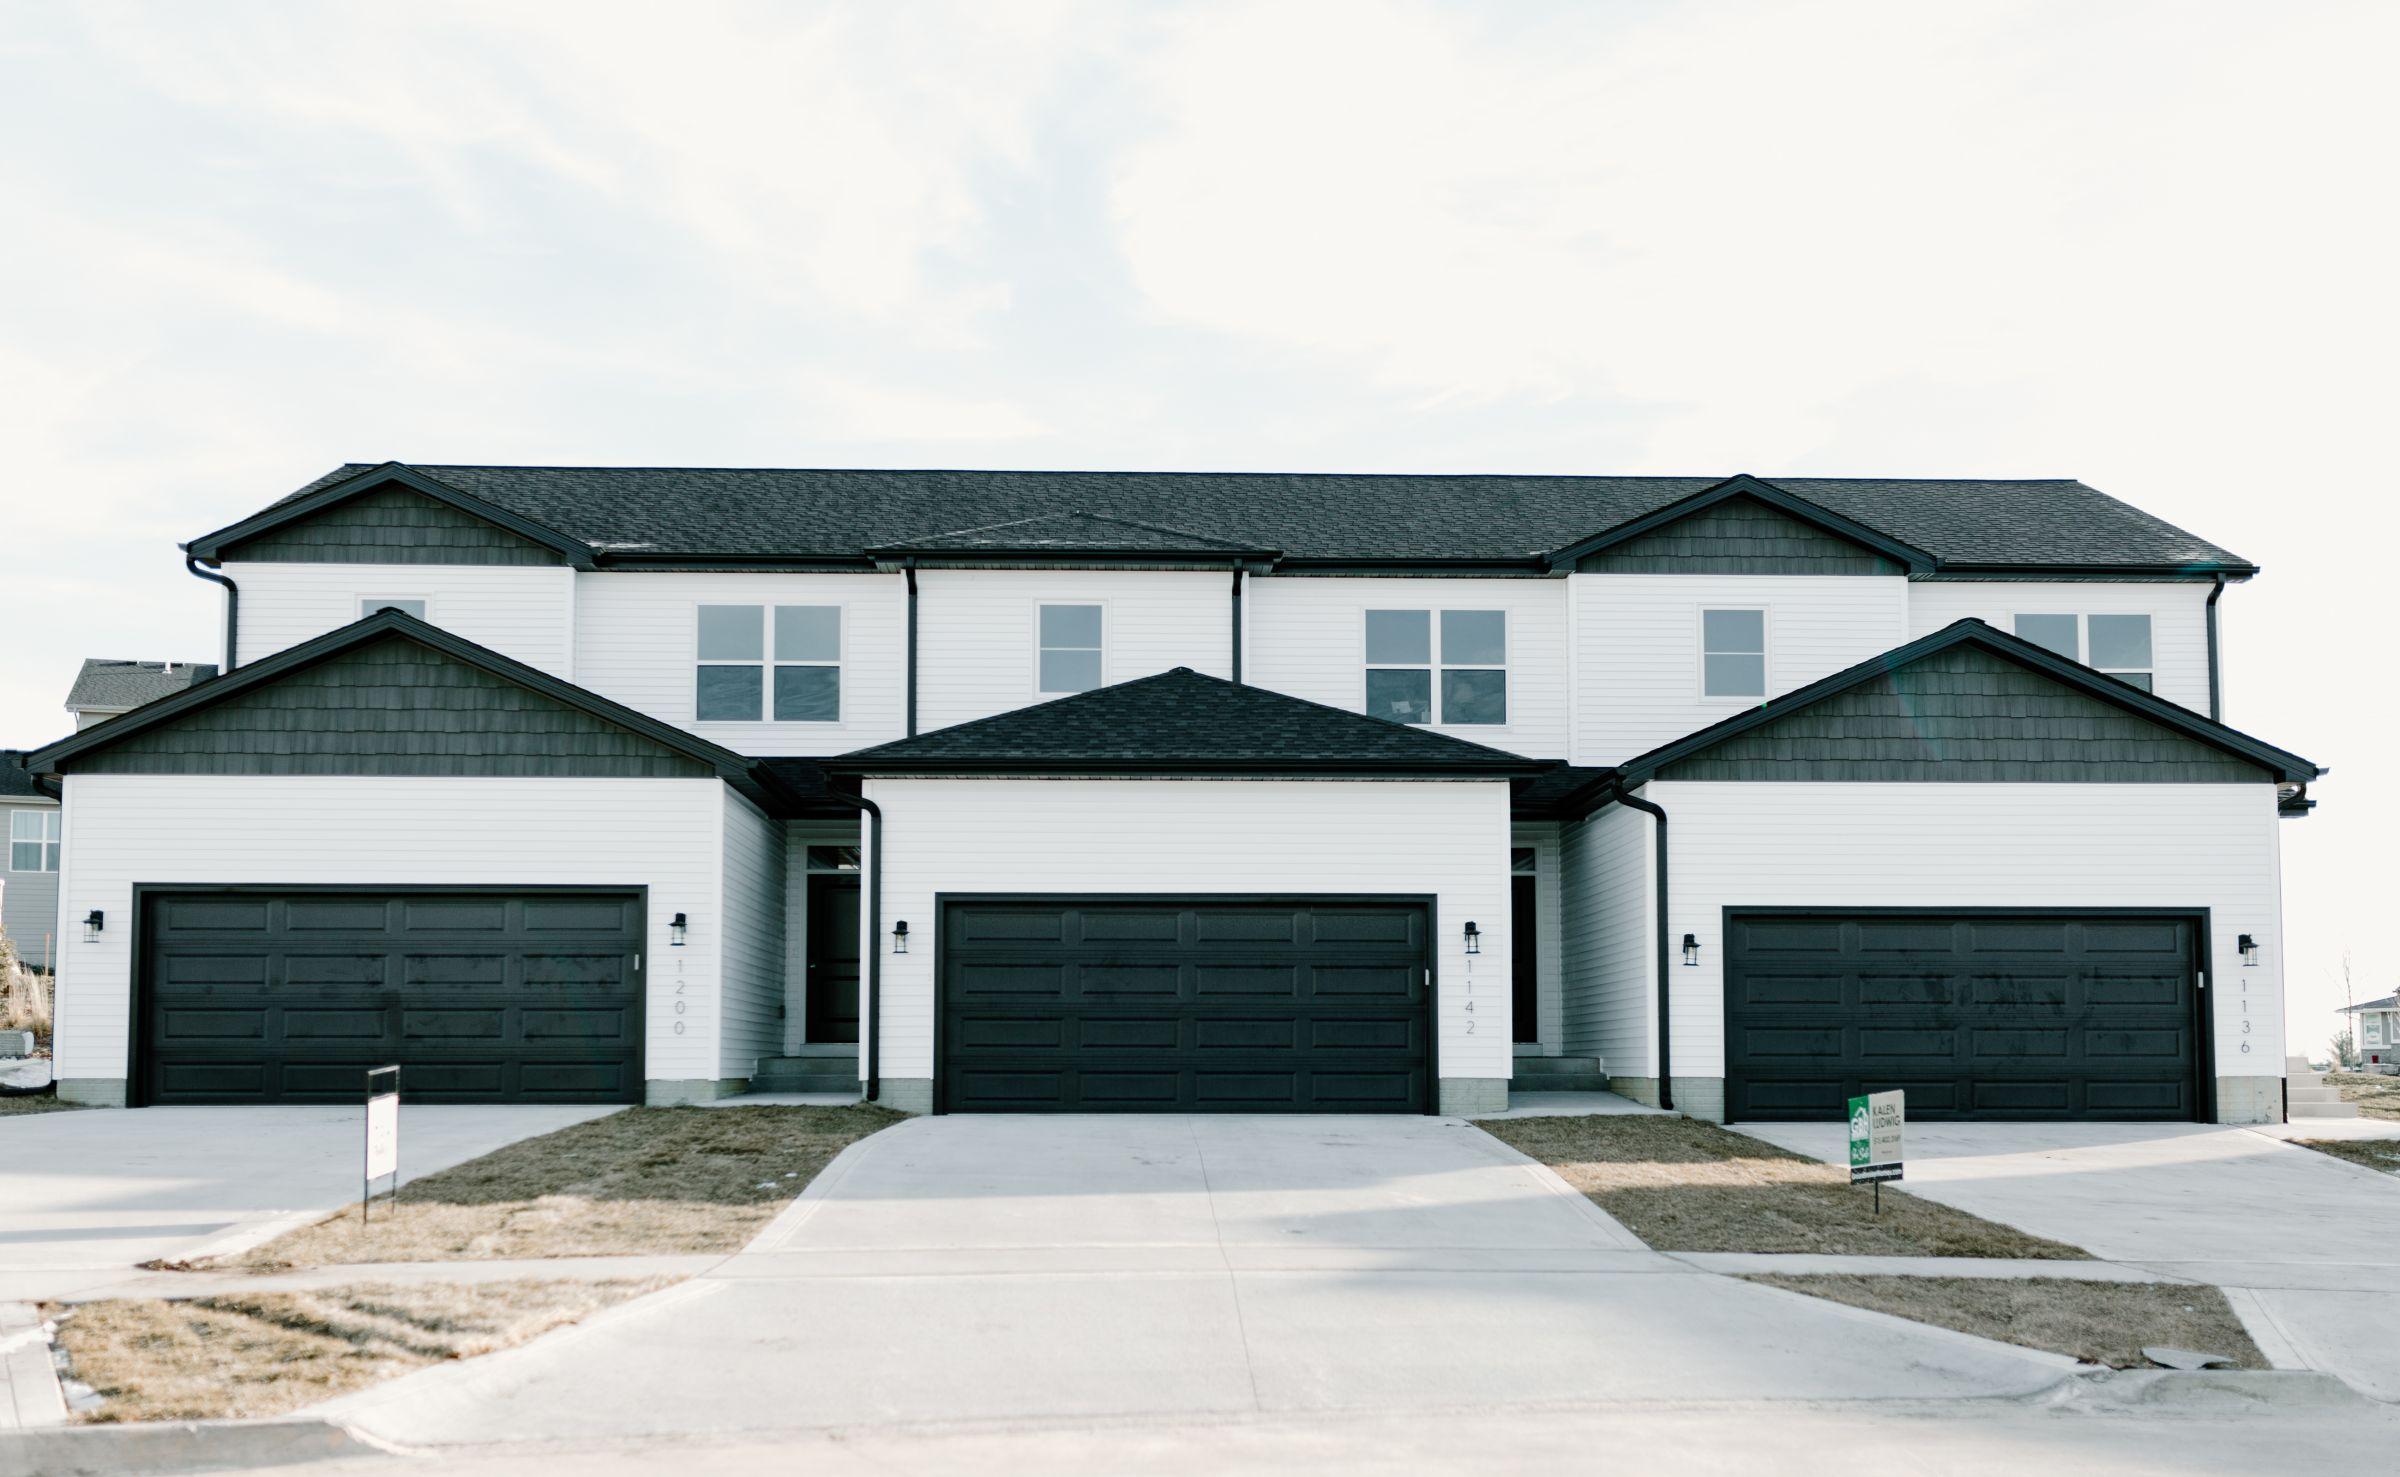 residential-warren-county-iowa-0-acres-listing-number-15138-5-2020-12-28-170248.jpg